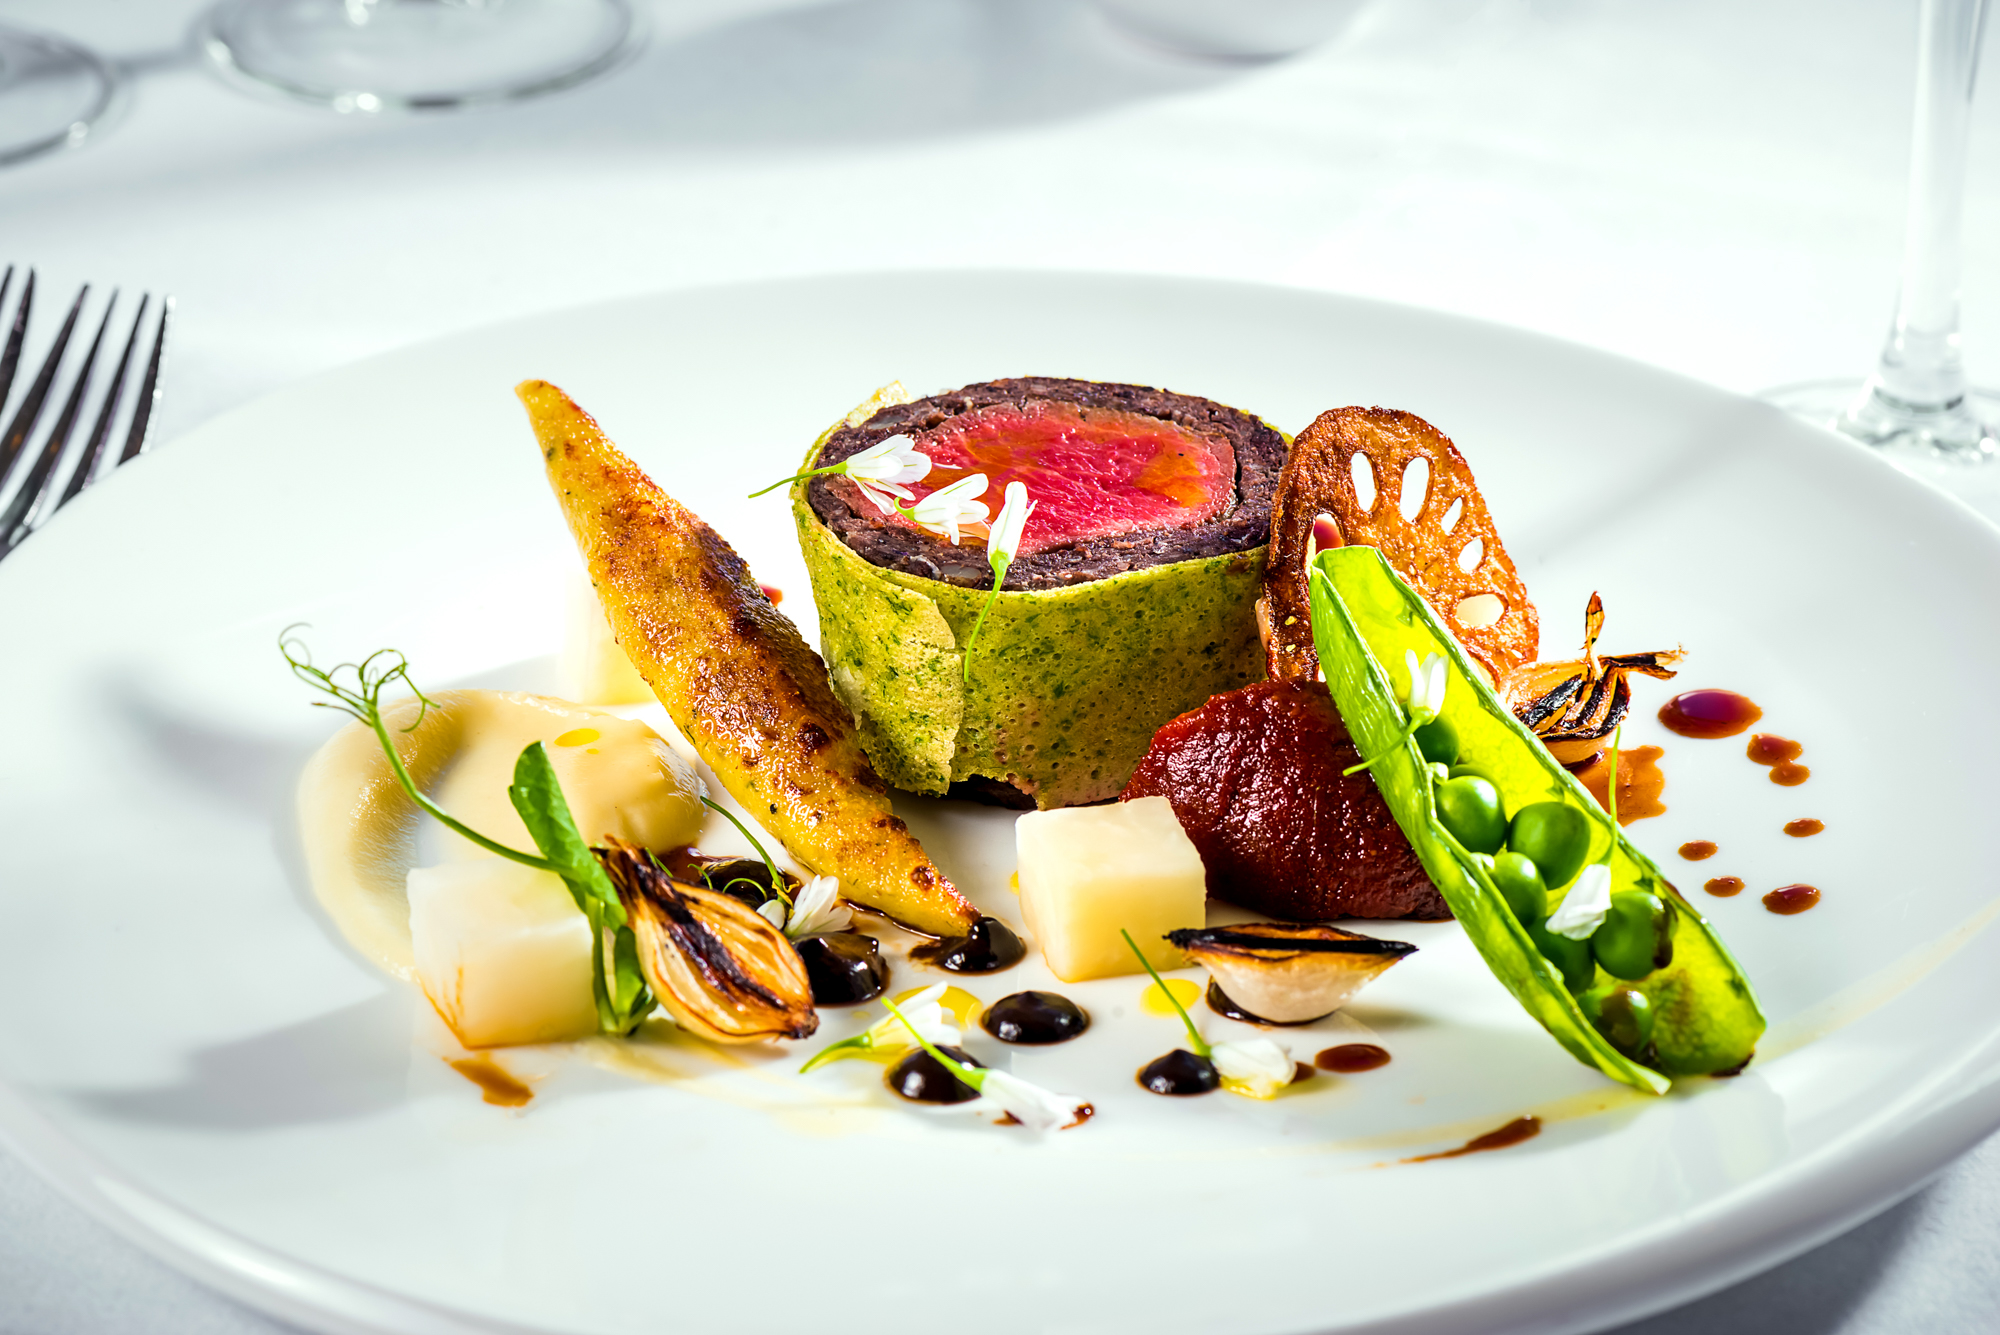 Lamb-Fillet-Mulranny-Park-Hotel-Food-Photography-2.jpg